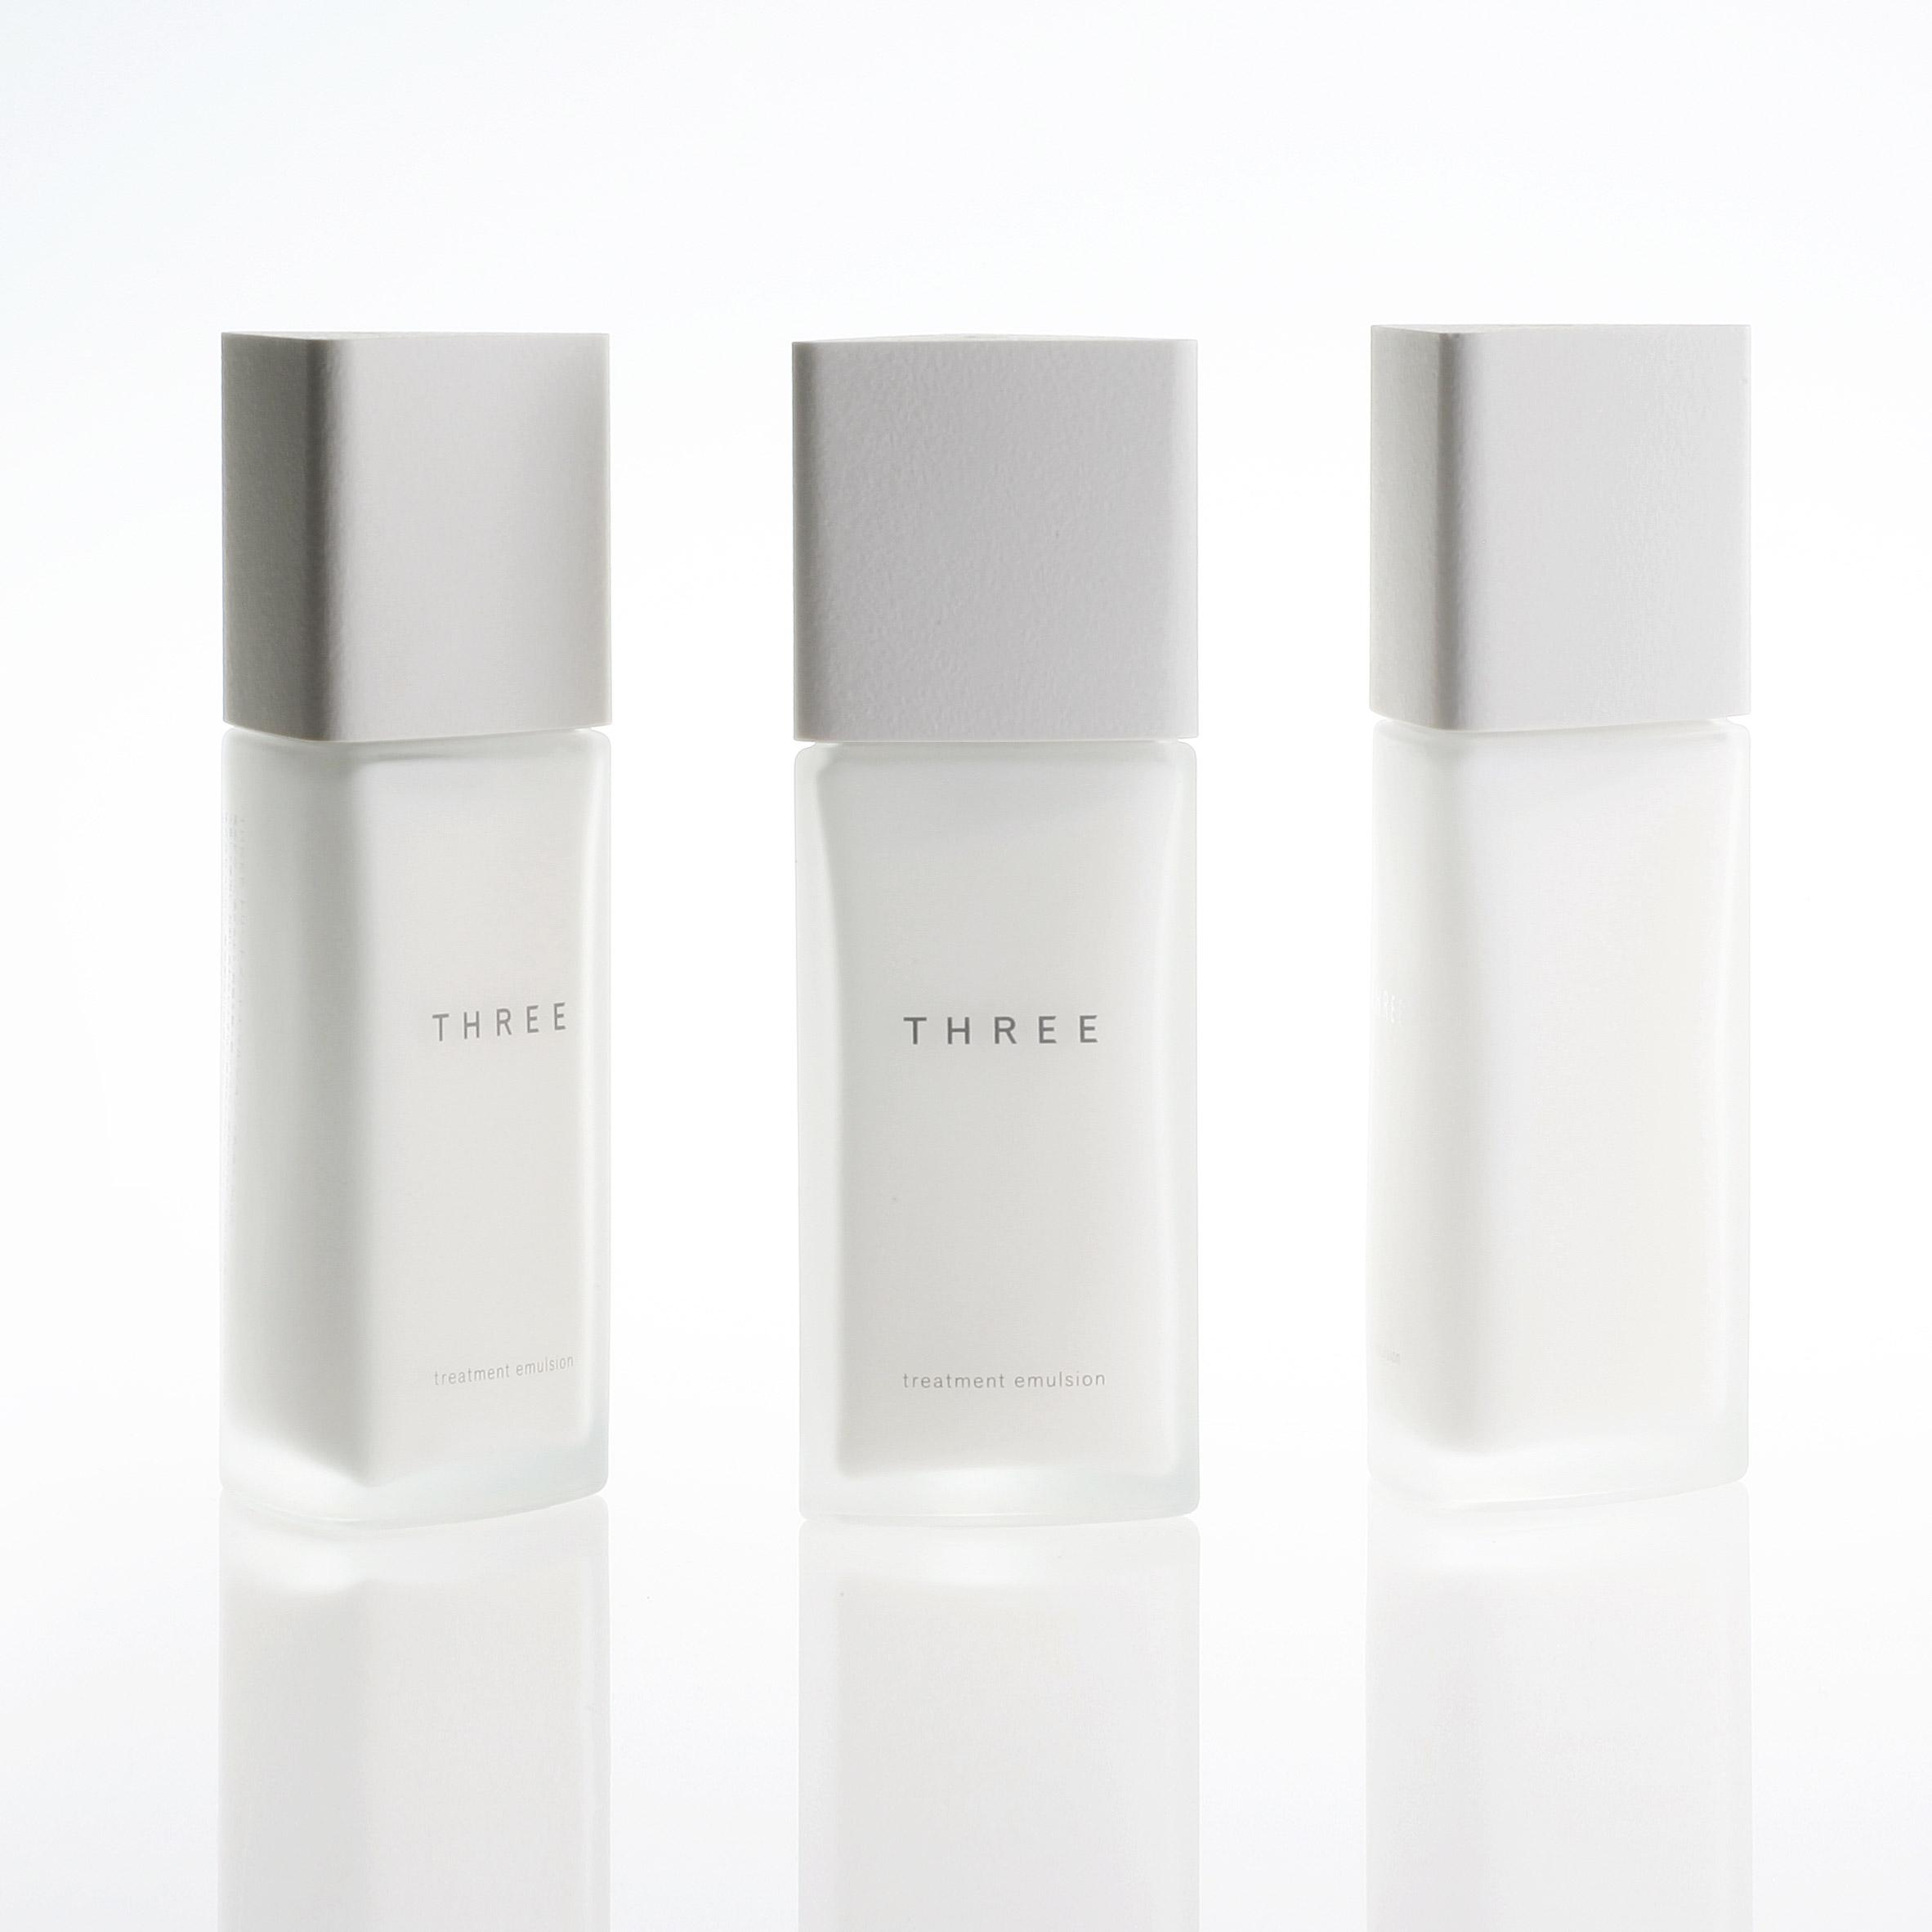 Tokujin Yoshioka designs minimal packaging for Japanese skincare brand